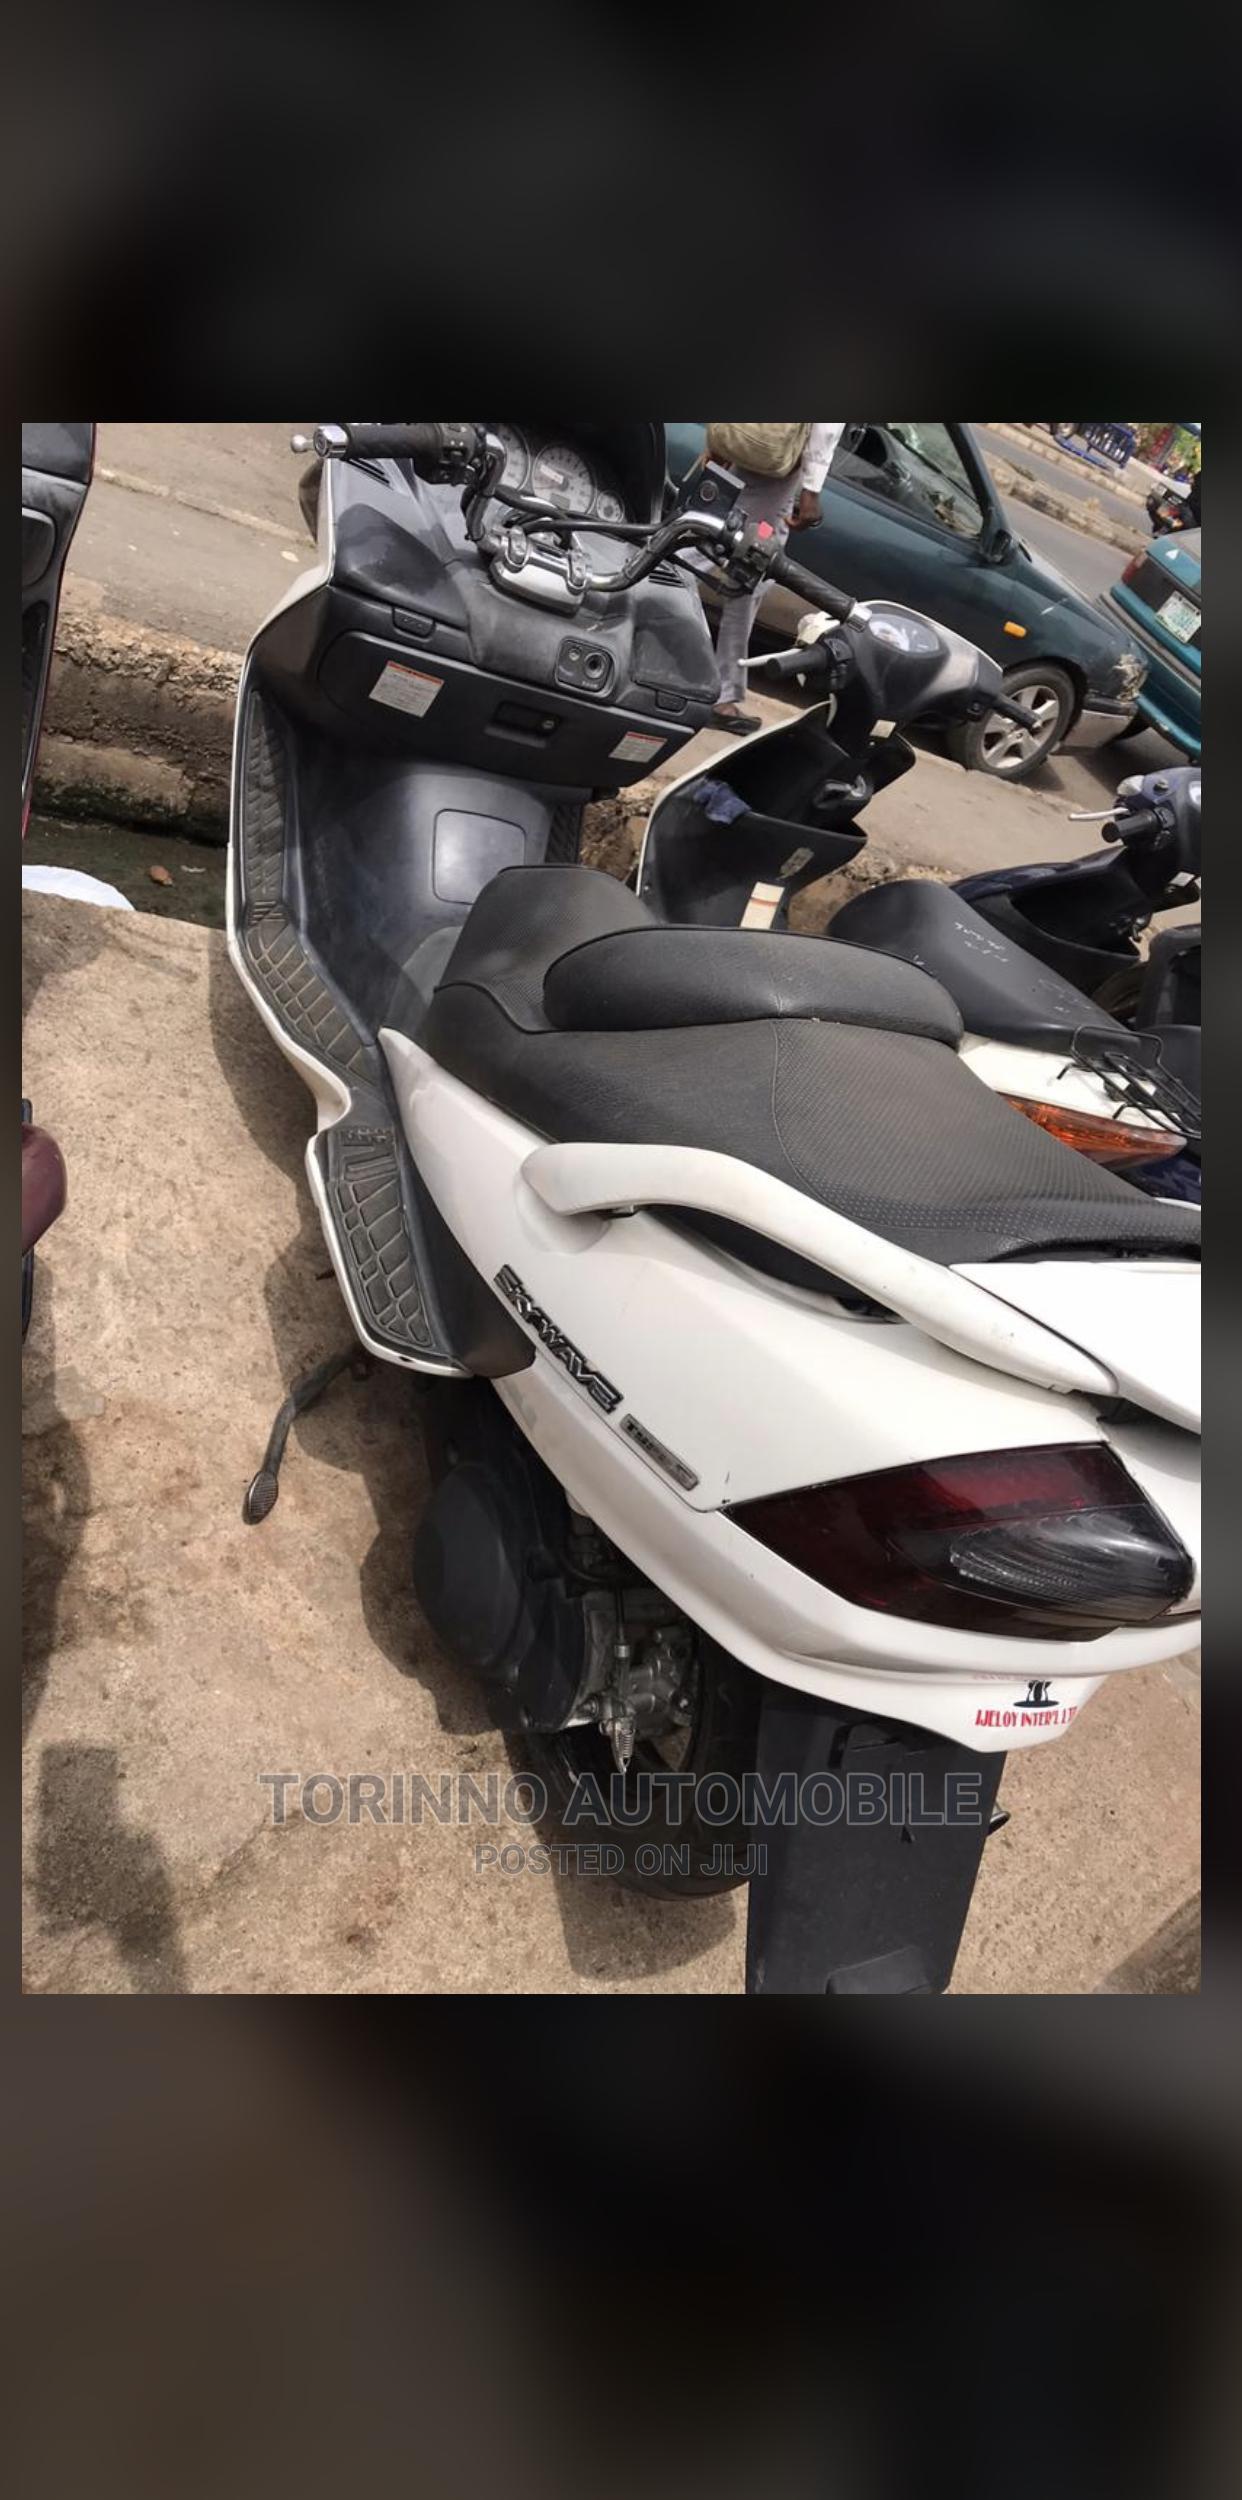 Suzuki Bike 2015 White | Motorcycles & Scooters for sale in Ibadan, Oyo State, Nigeria